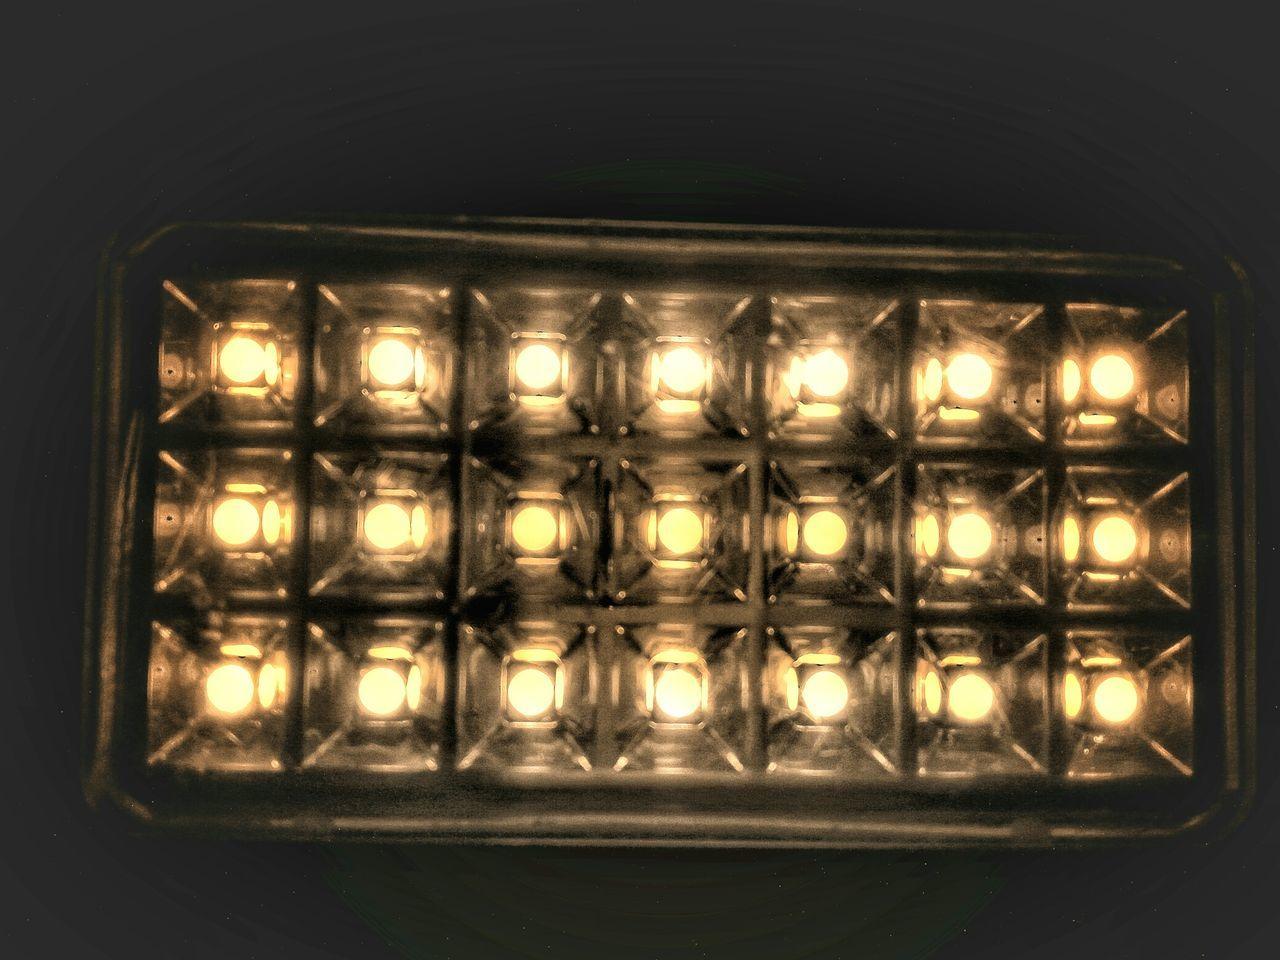 illuminated, lighting equipment, shape, no people, indoors, pattern, electricity, night, close-up, black background, spotlight